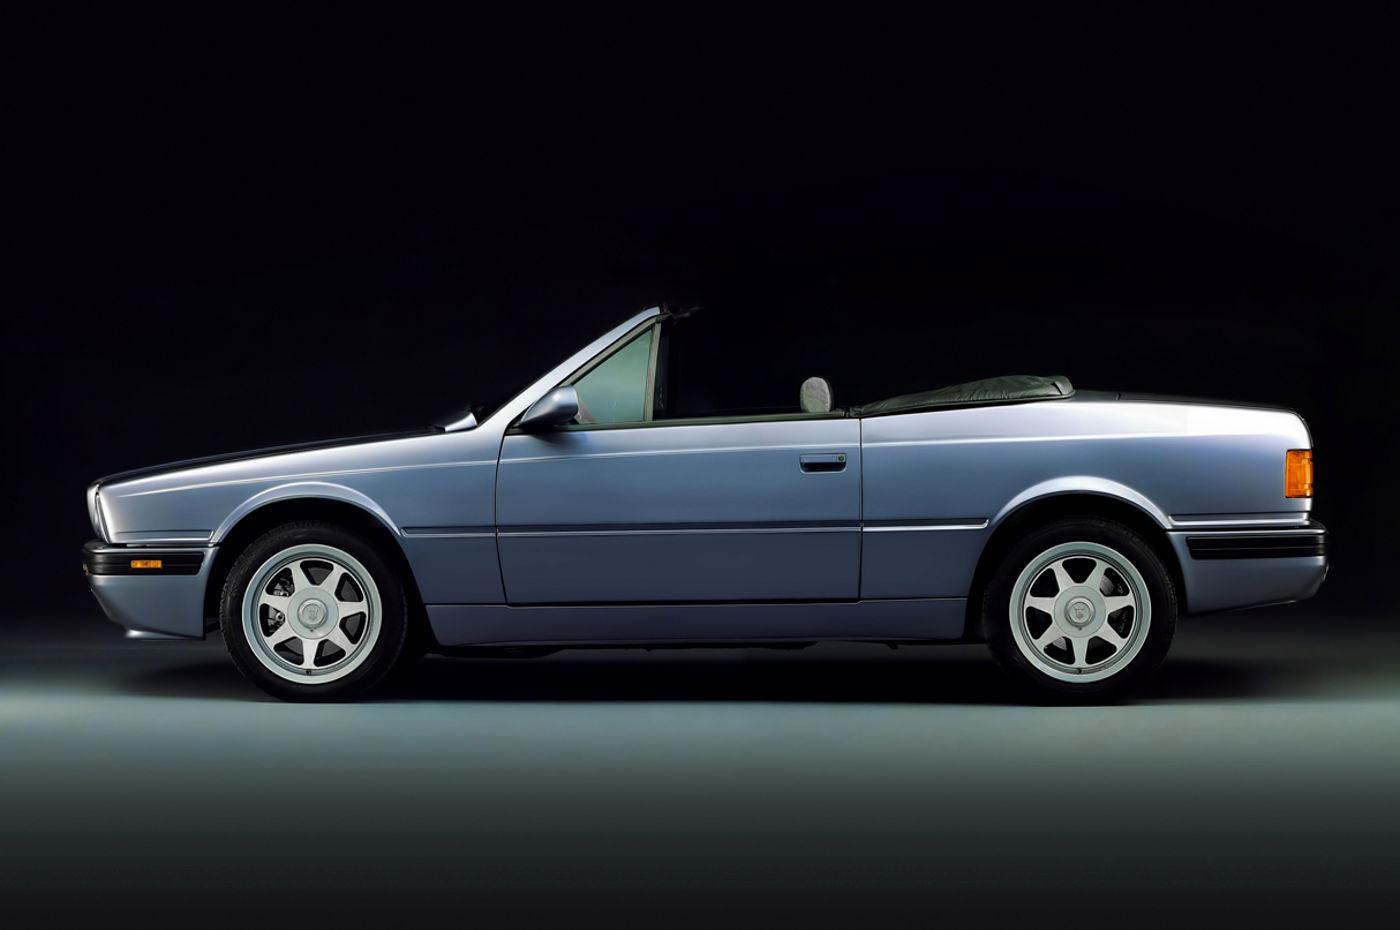 Maserati Classic - Biturbo Spyder Cabriolet - carrosserie grise - vue profil